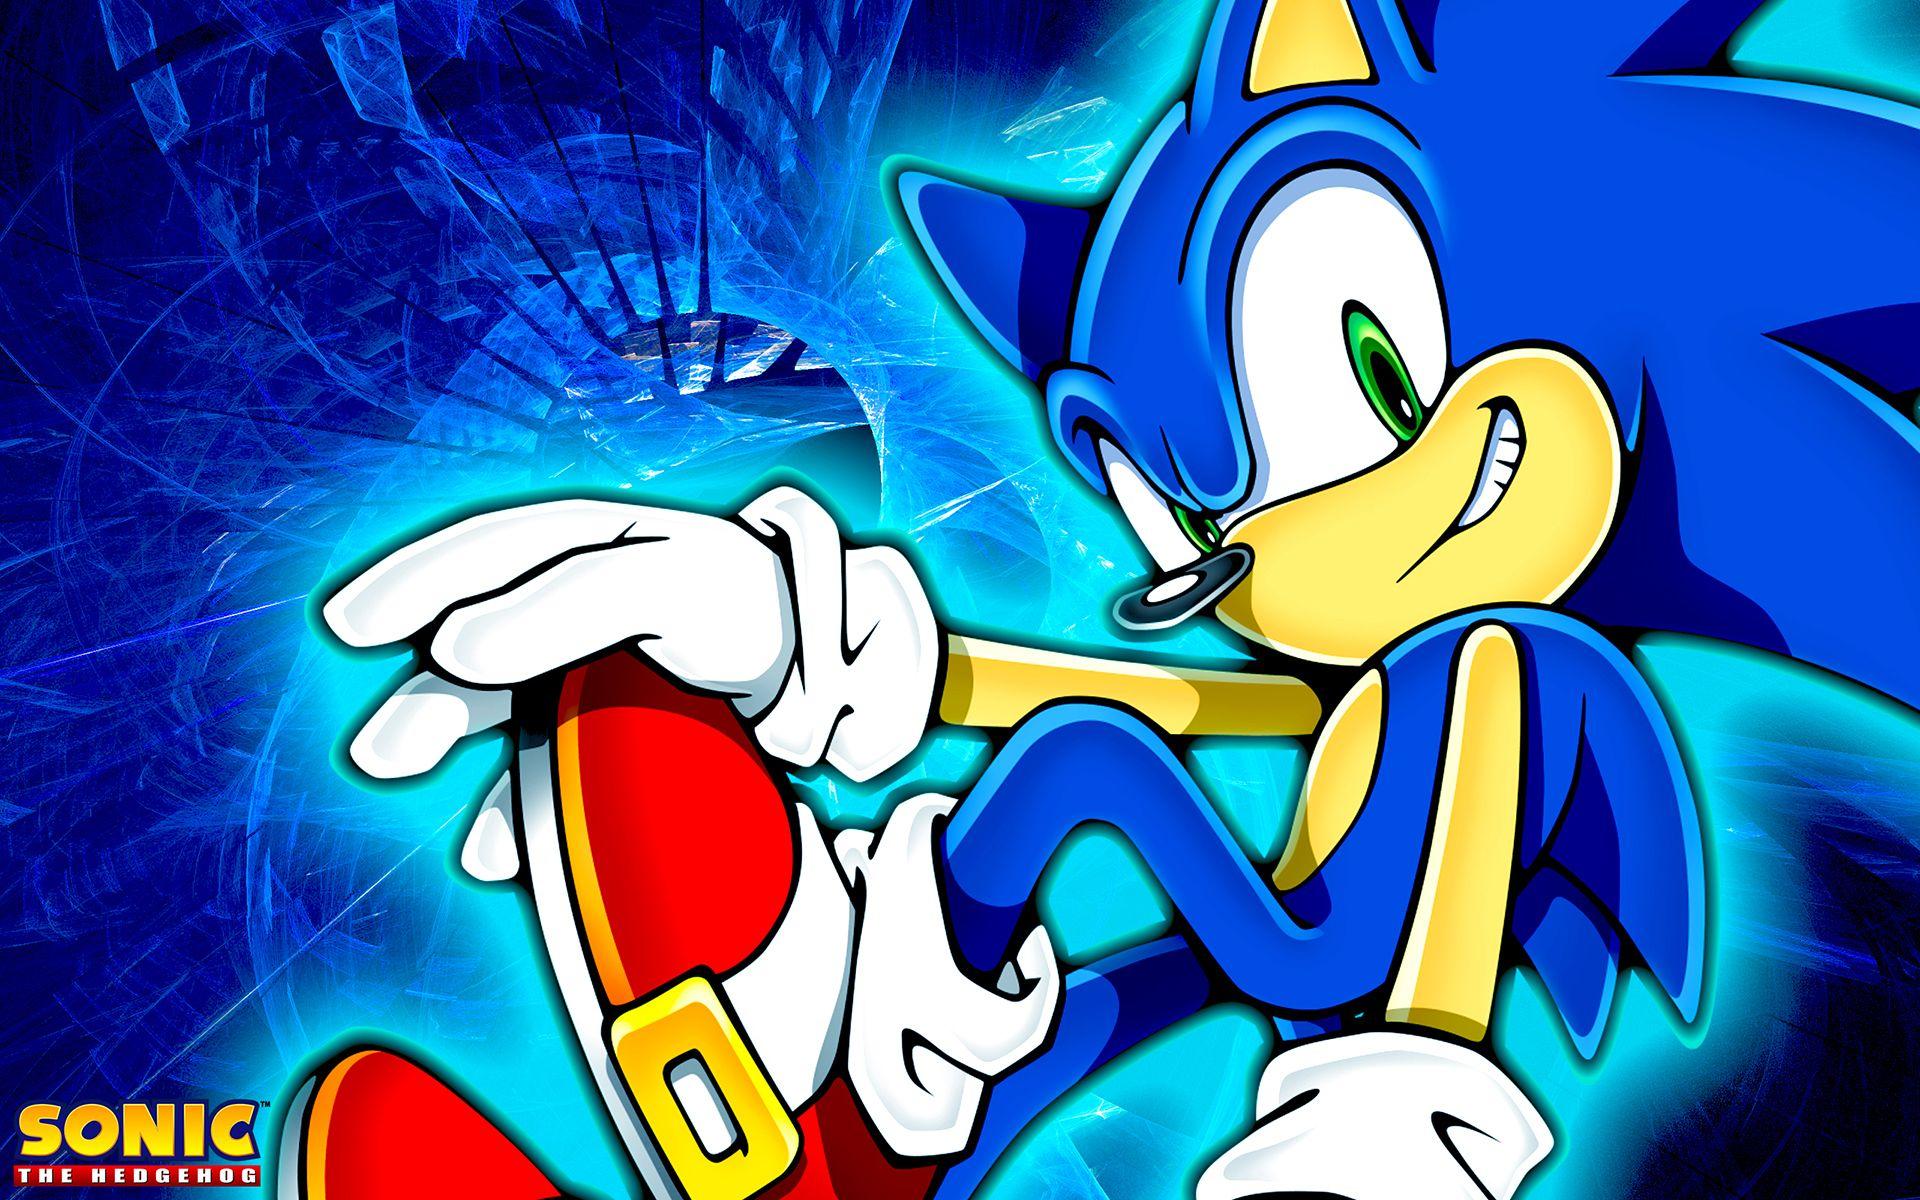 Sonic The Hedgehog Wallpaper For Bedrooms Classic Sonic The Hedgehog And Friends Wallpaper By Sonic